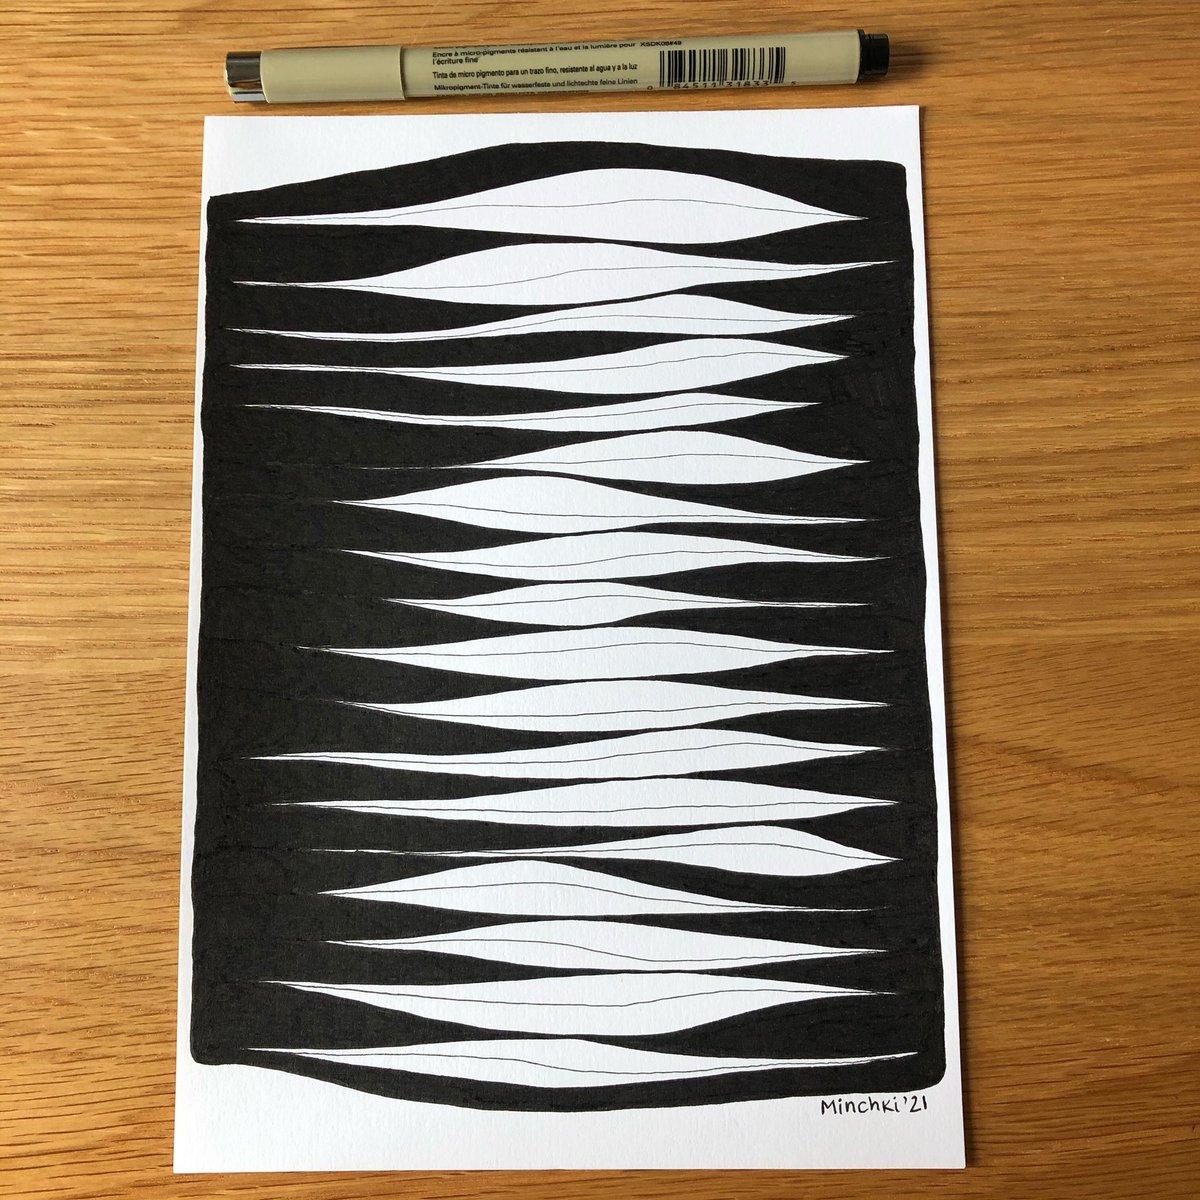 #drawingoftheday #design #inkpenart #abstract #artdaily #mind #keepingoing #handdrawn #minchkipatterns #milenamihaylova #EtsySeller #etsyfinds #artistsontwitter #myartwork https://t.co/K3pBWA4n61